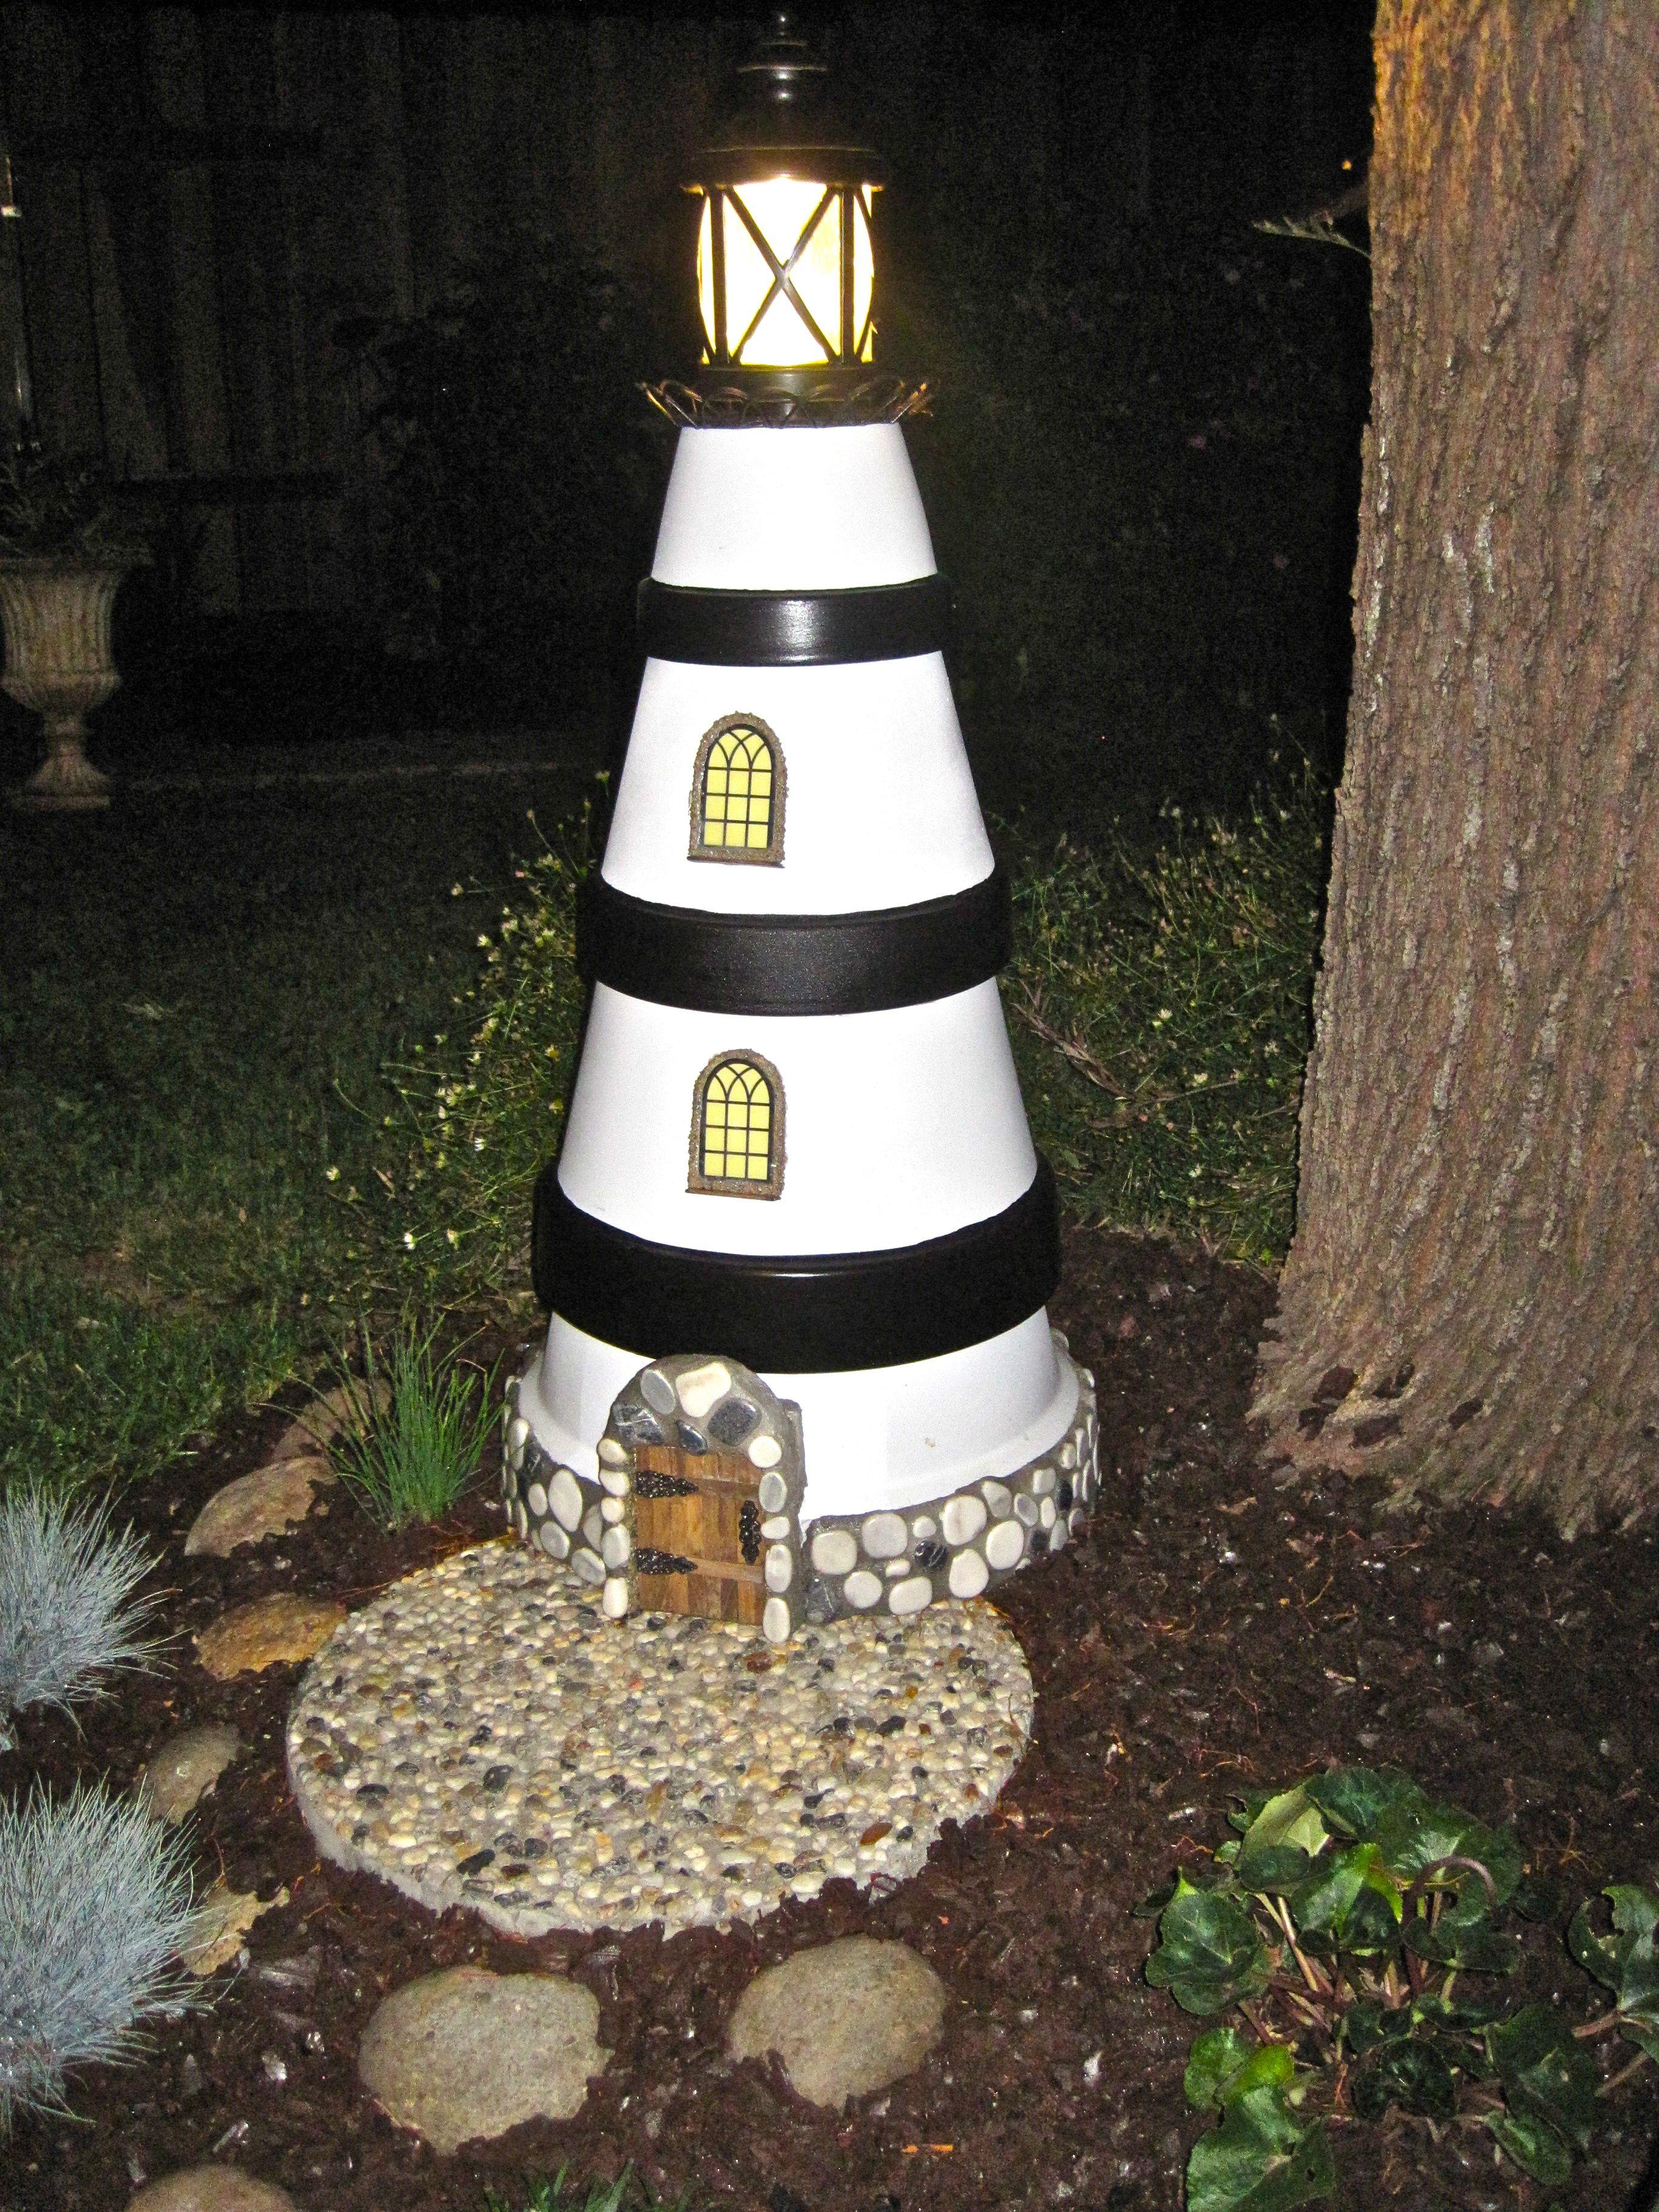 Diy make a clay pot lighthouse diy craft projects - Clay Pot Lighthouse